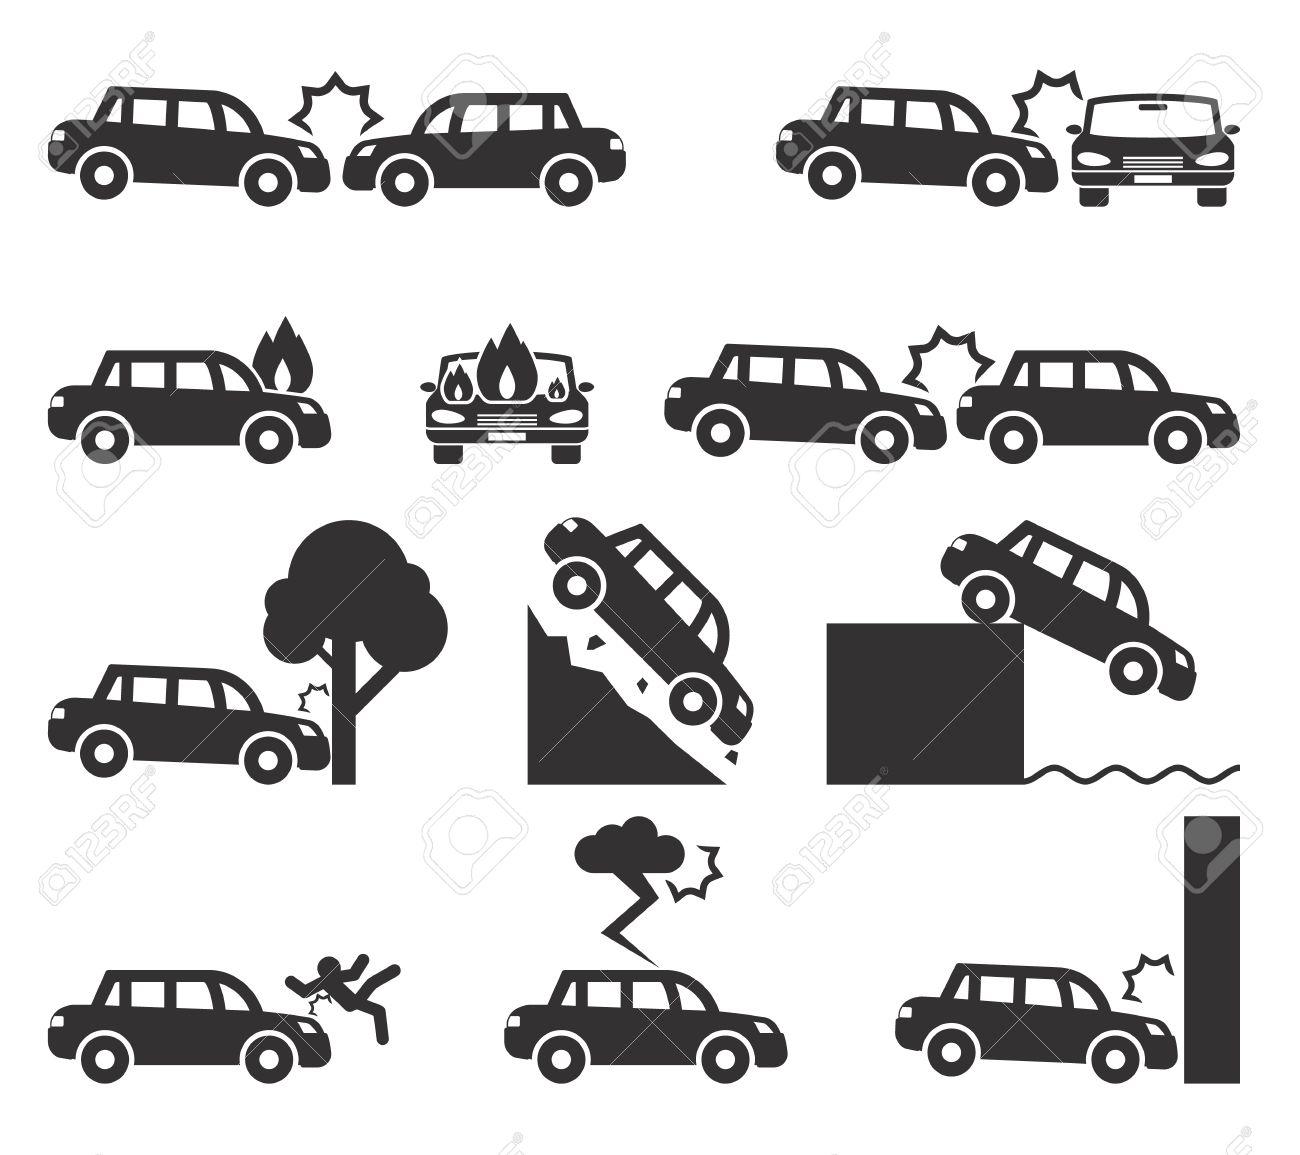 Autounfall Und Unfälle Icon Set Lizenzfrei Nutzbare Vektorgrafiken ...